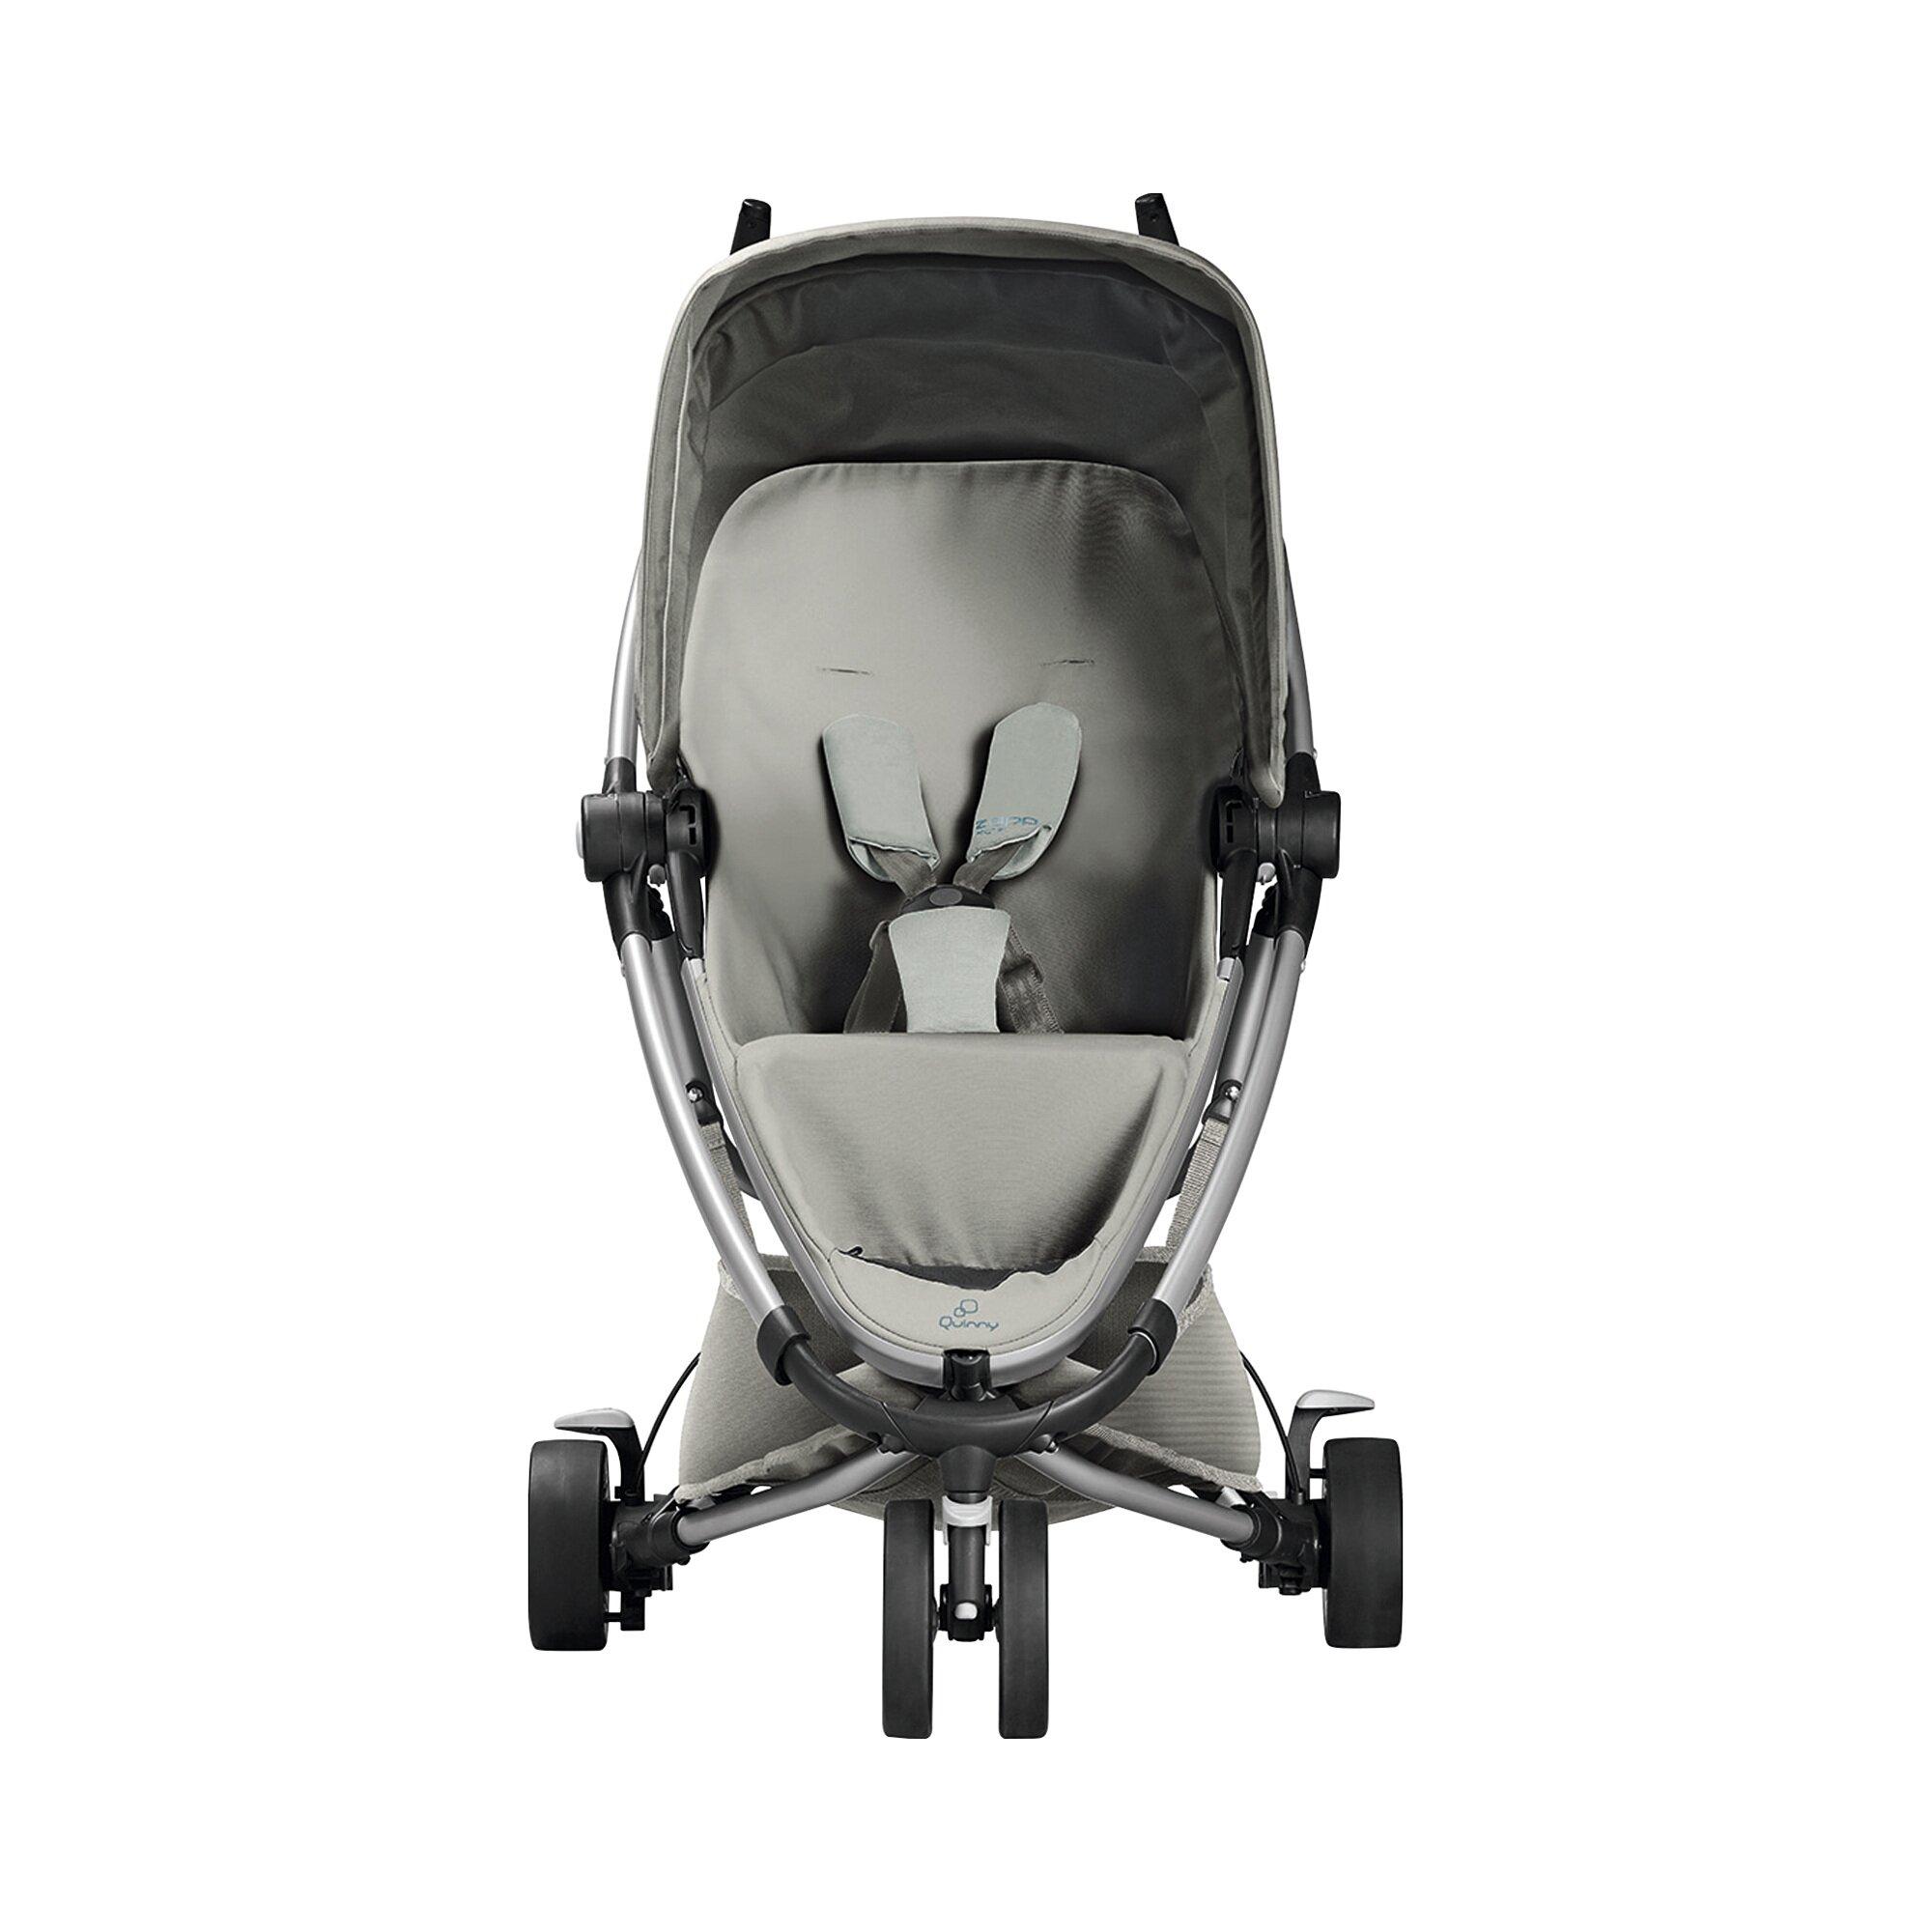 zapp-xtra-2-buggy-mit-liegefunktion-mehrfarbig, 191.99 EUR @ babywalz-de